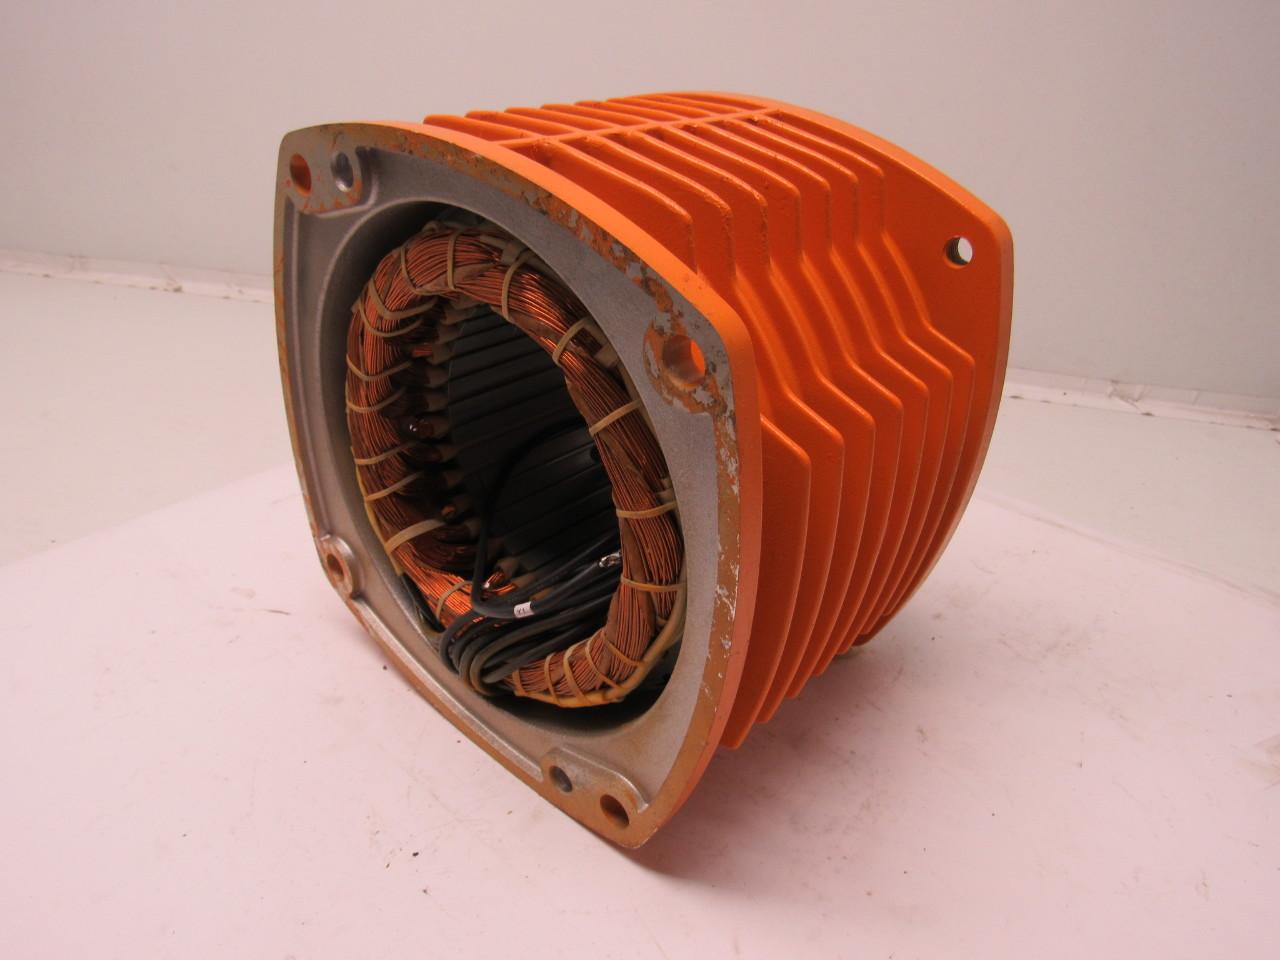 Motor stator for Linear induction motor winding